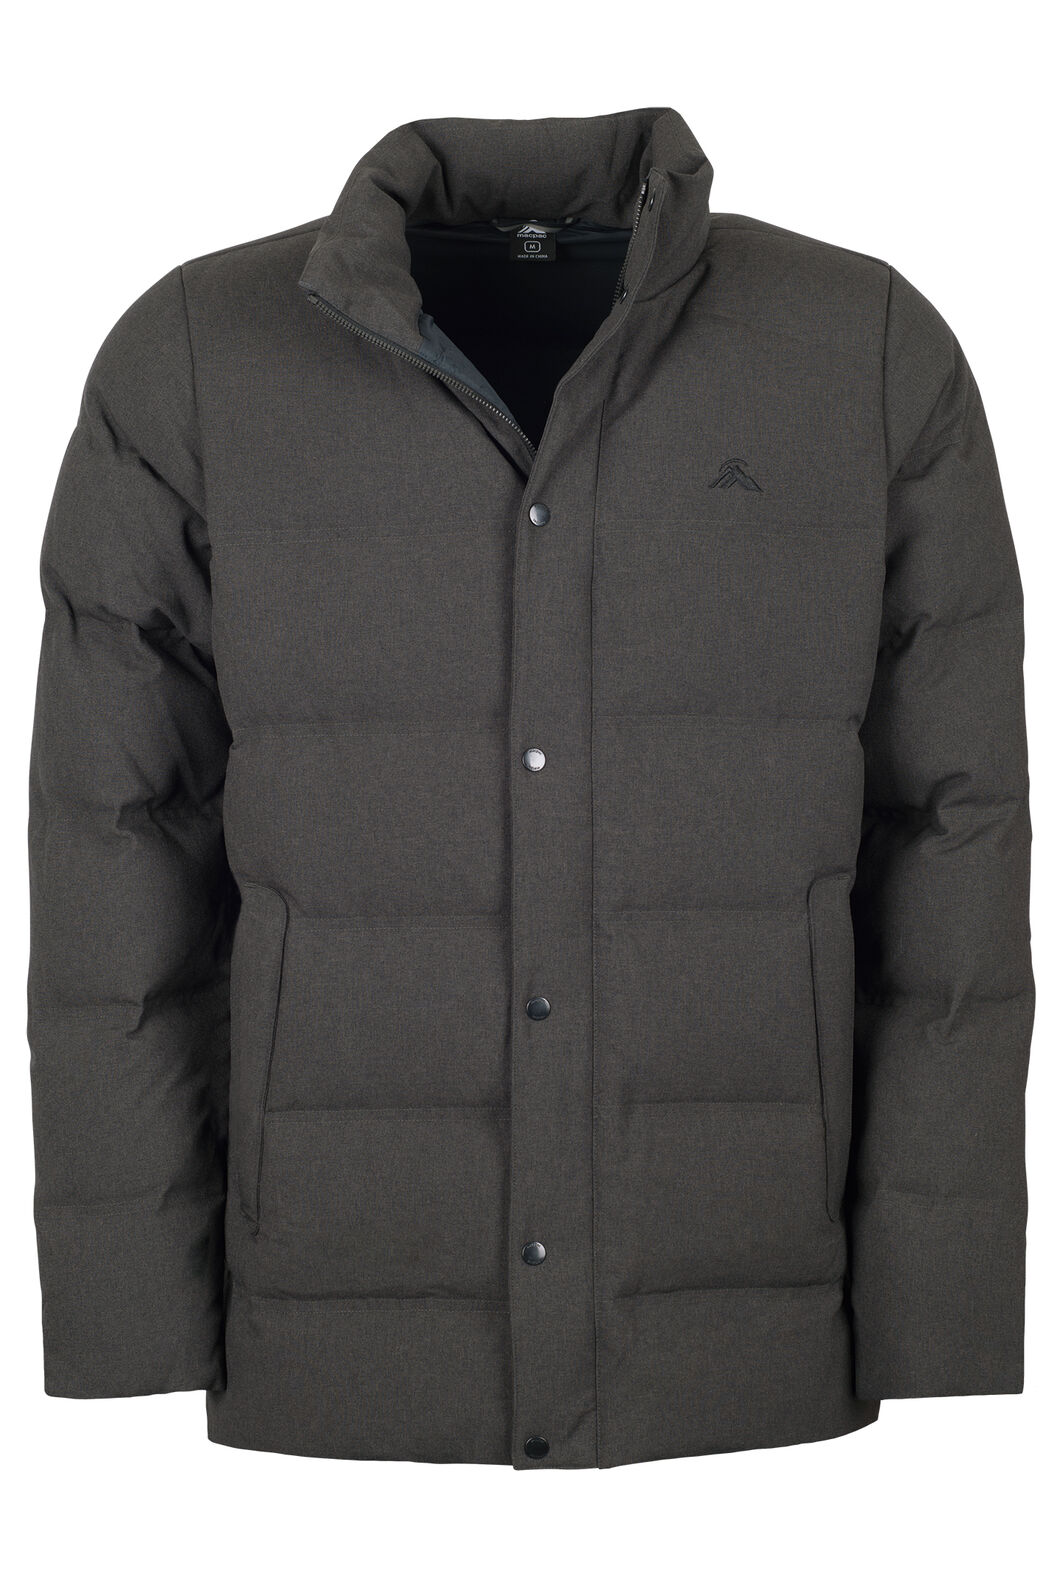 Meridian Down Jacket - Men's, Charcoal Marle, hi-res